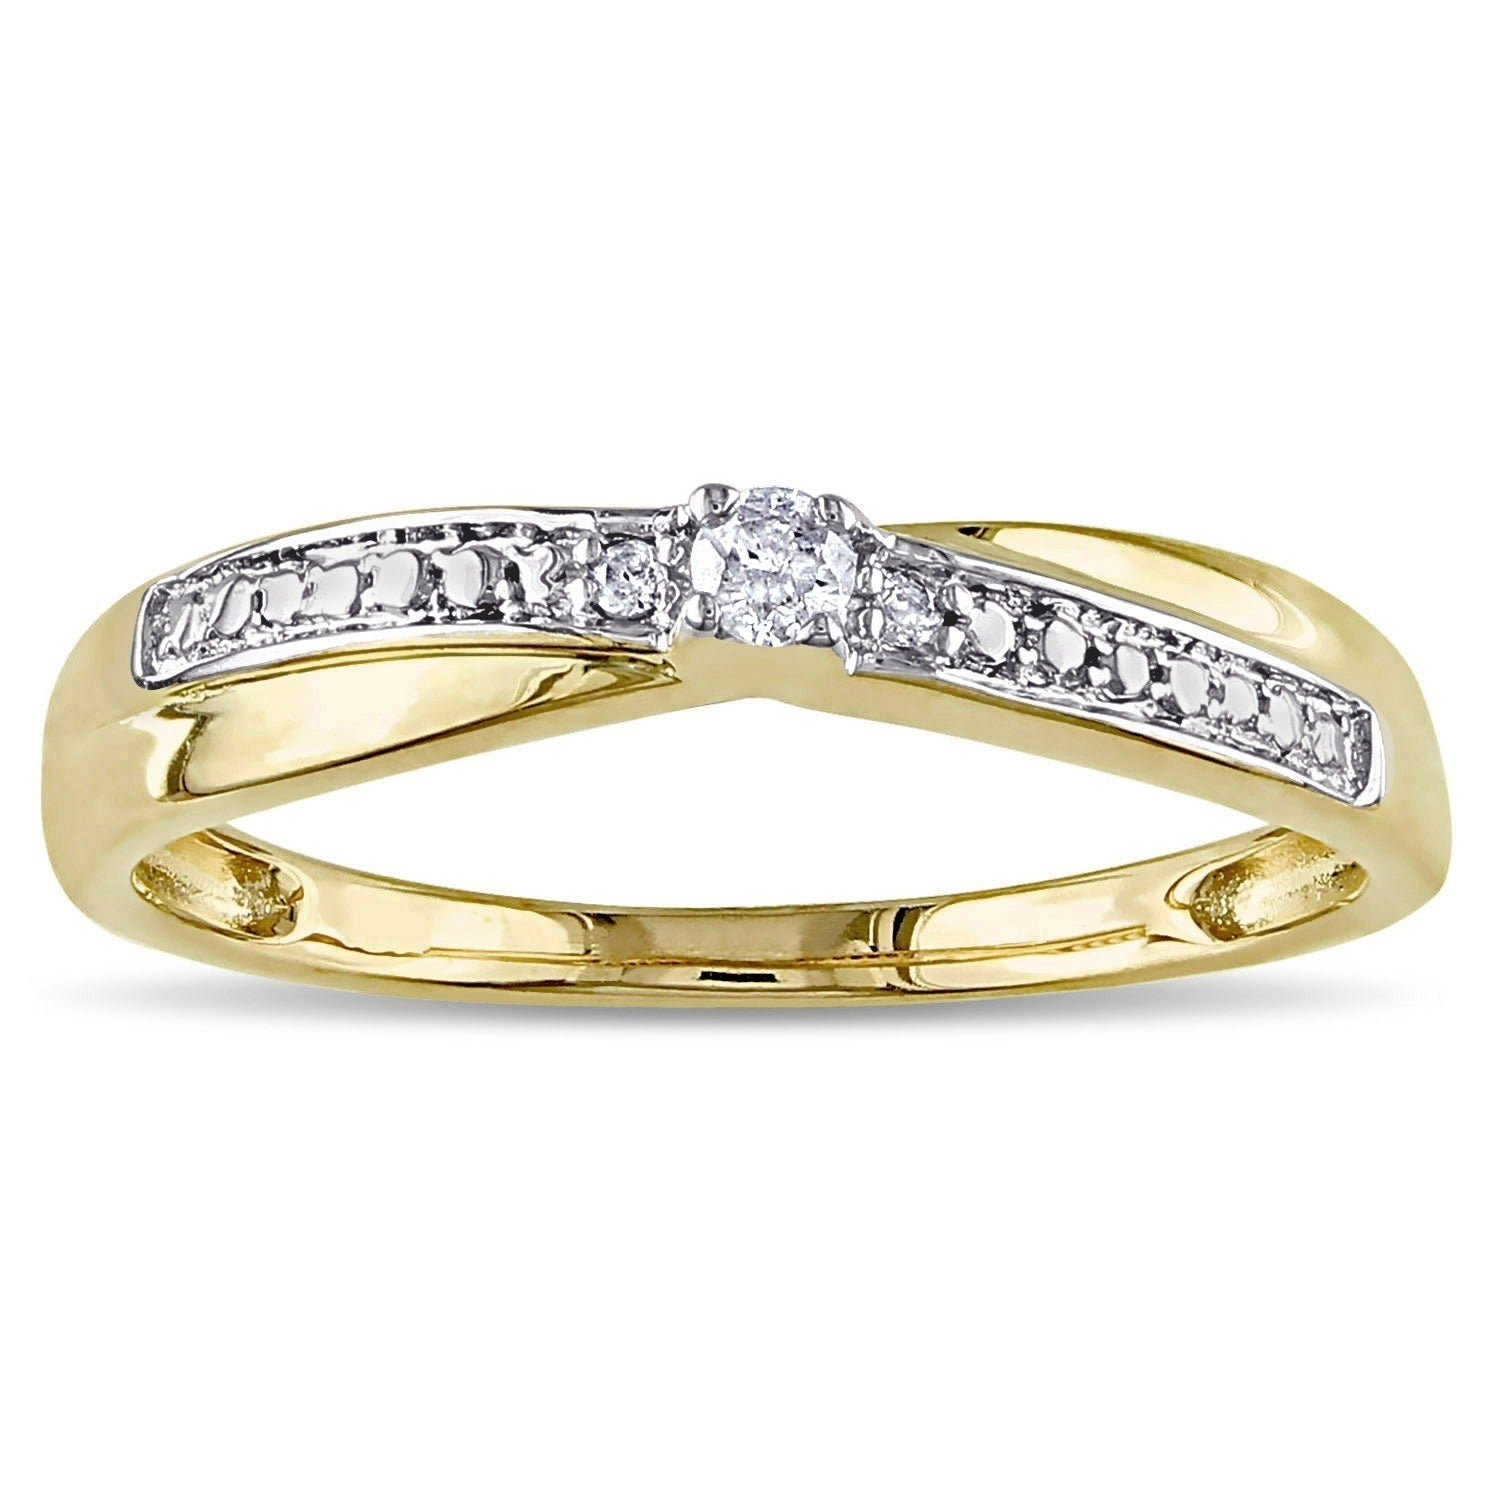 2c09d8b0842b2 Miadora 10k Yellow Gold Diamond Promise Ring